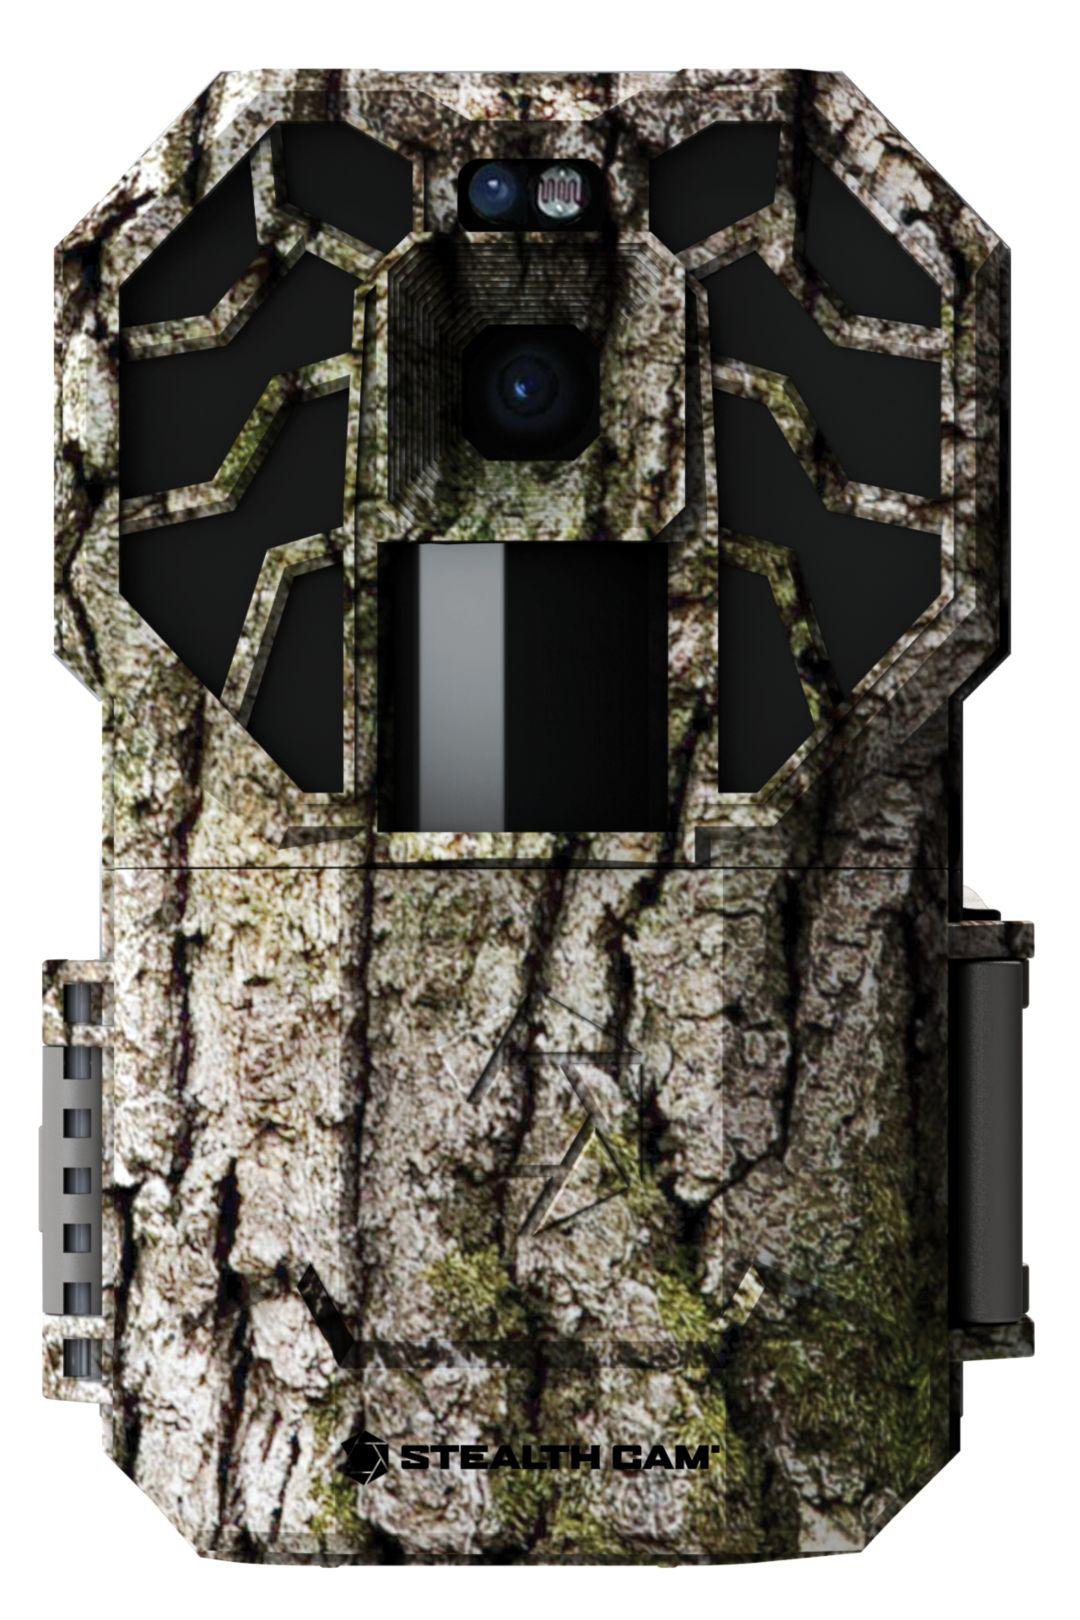 Stealth Cam G45NG Pro No Glo Trail Camera – 22MP